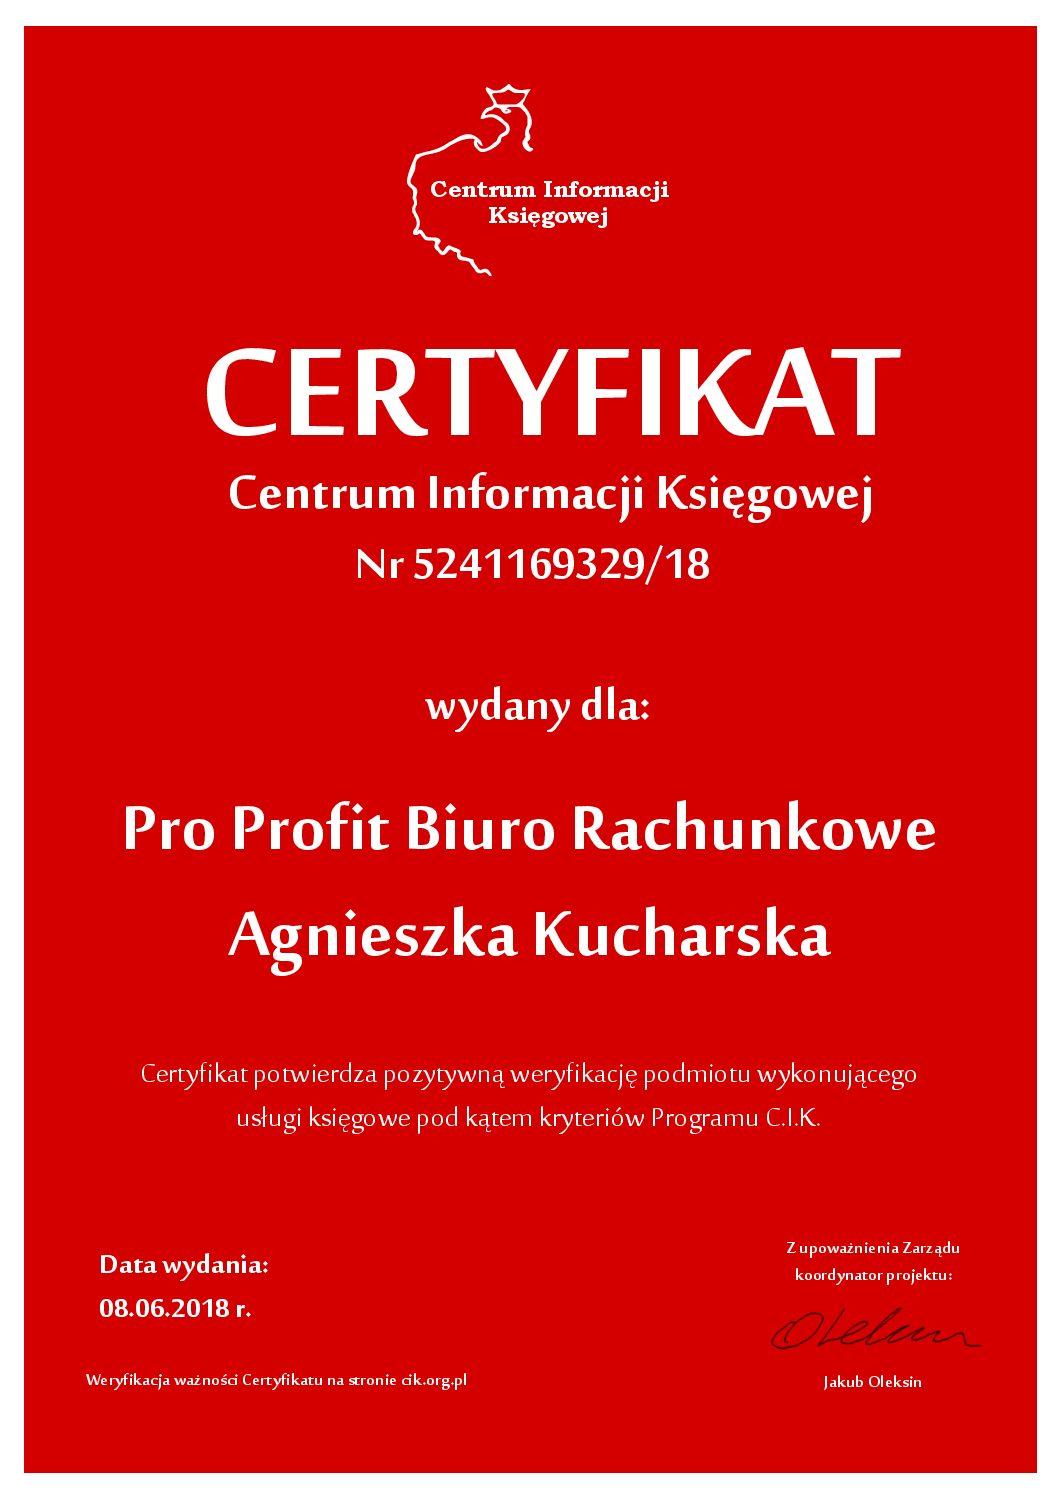 Certyfikat C.I.K.